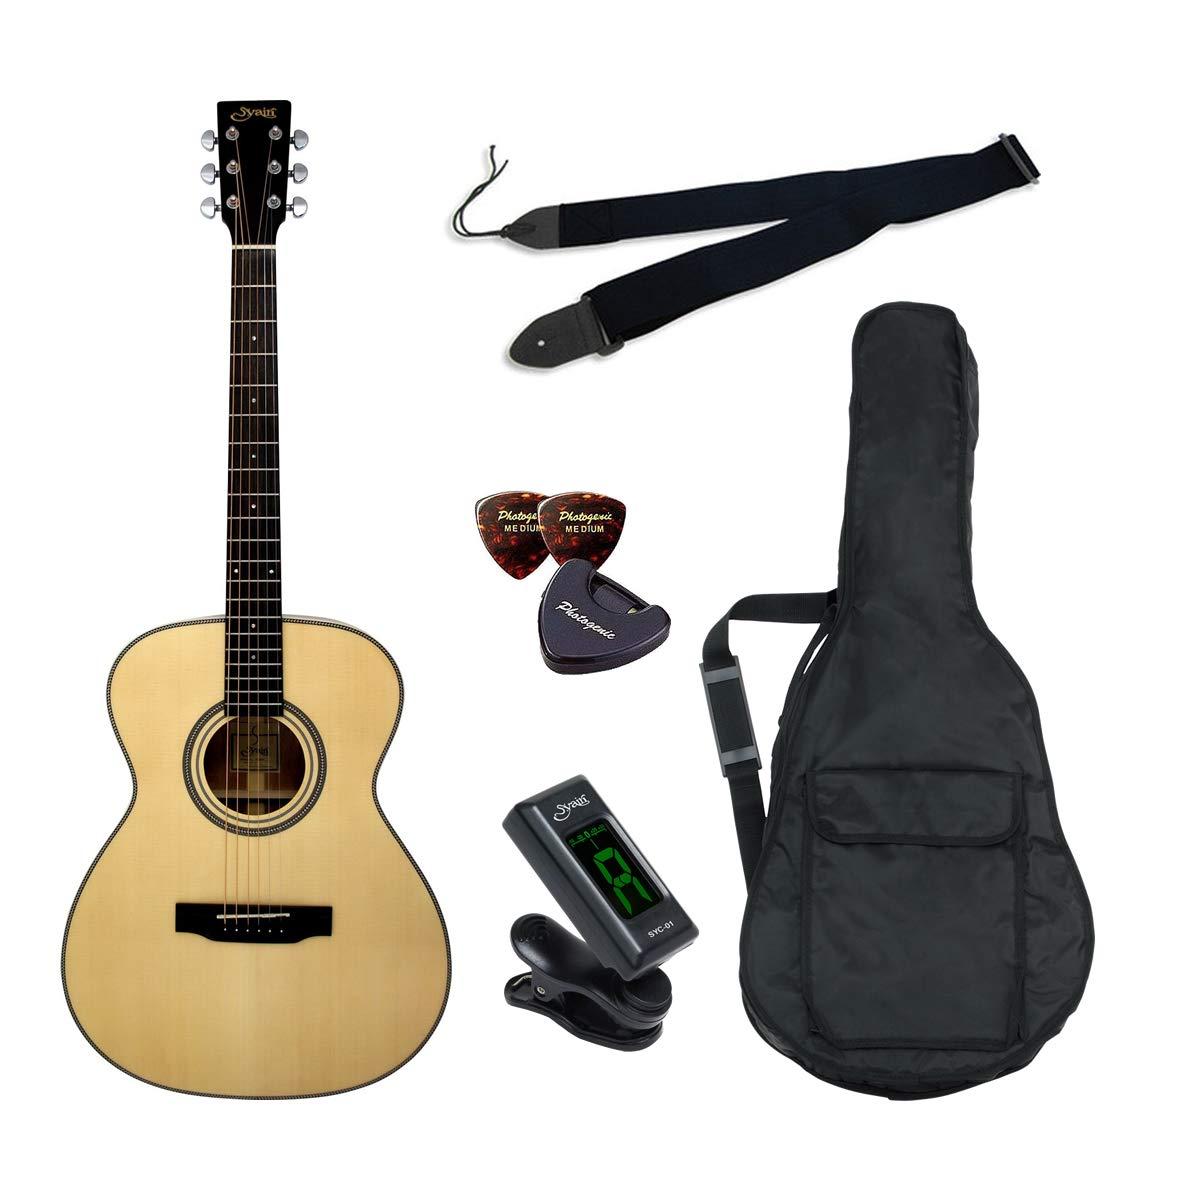 S.Yairi ヤイリ アコースティックギター Amazonオリジナル7点 クイックスタートセット YF-05/N  ナチュラル B07Q7VB2ZM